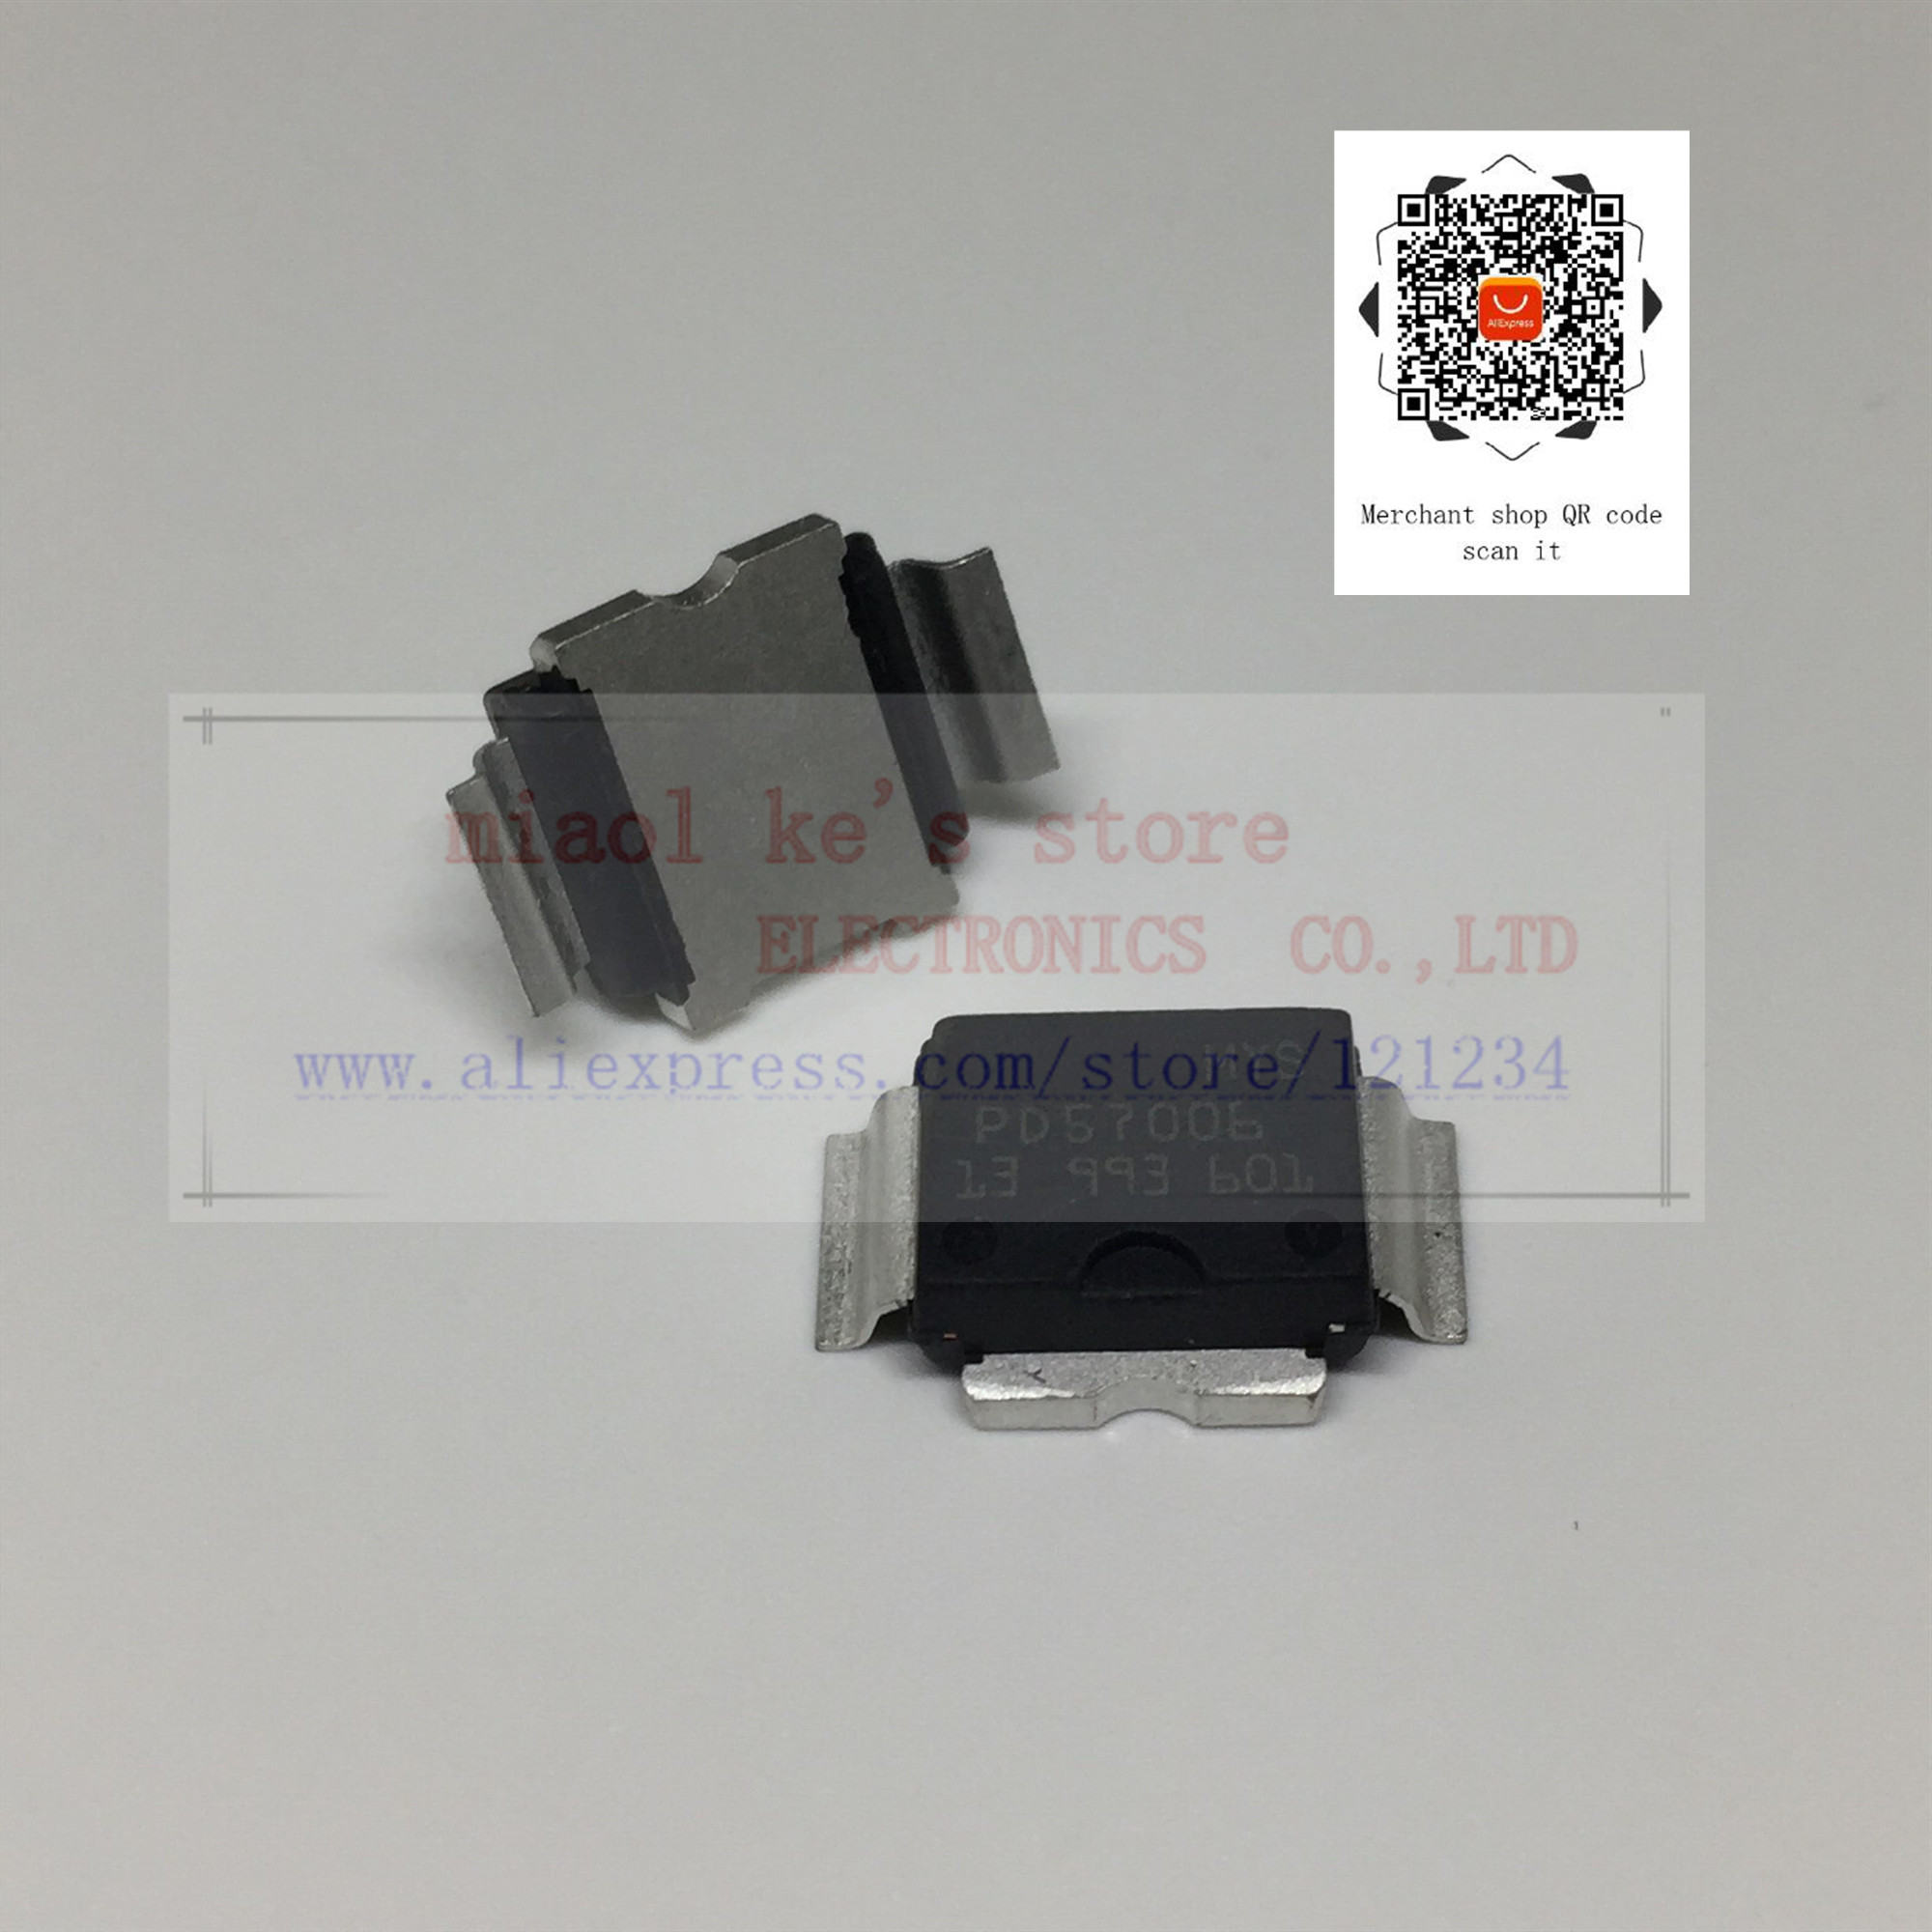 100%New original; PD57006TR-E PD57006TR PD57006-E PD57006 PD 57006 - FET RF 65V 1A 6W 15dB 945MHZ LDMOS PWRSO-10100%New original; PD57006TR-E PD57006TR PD57006-E PD57006 PD 57006 - FET RF 65V 1A 6W 15dB 945MHZ LDMOS PWRSO-10